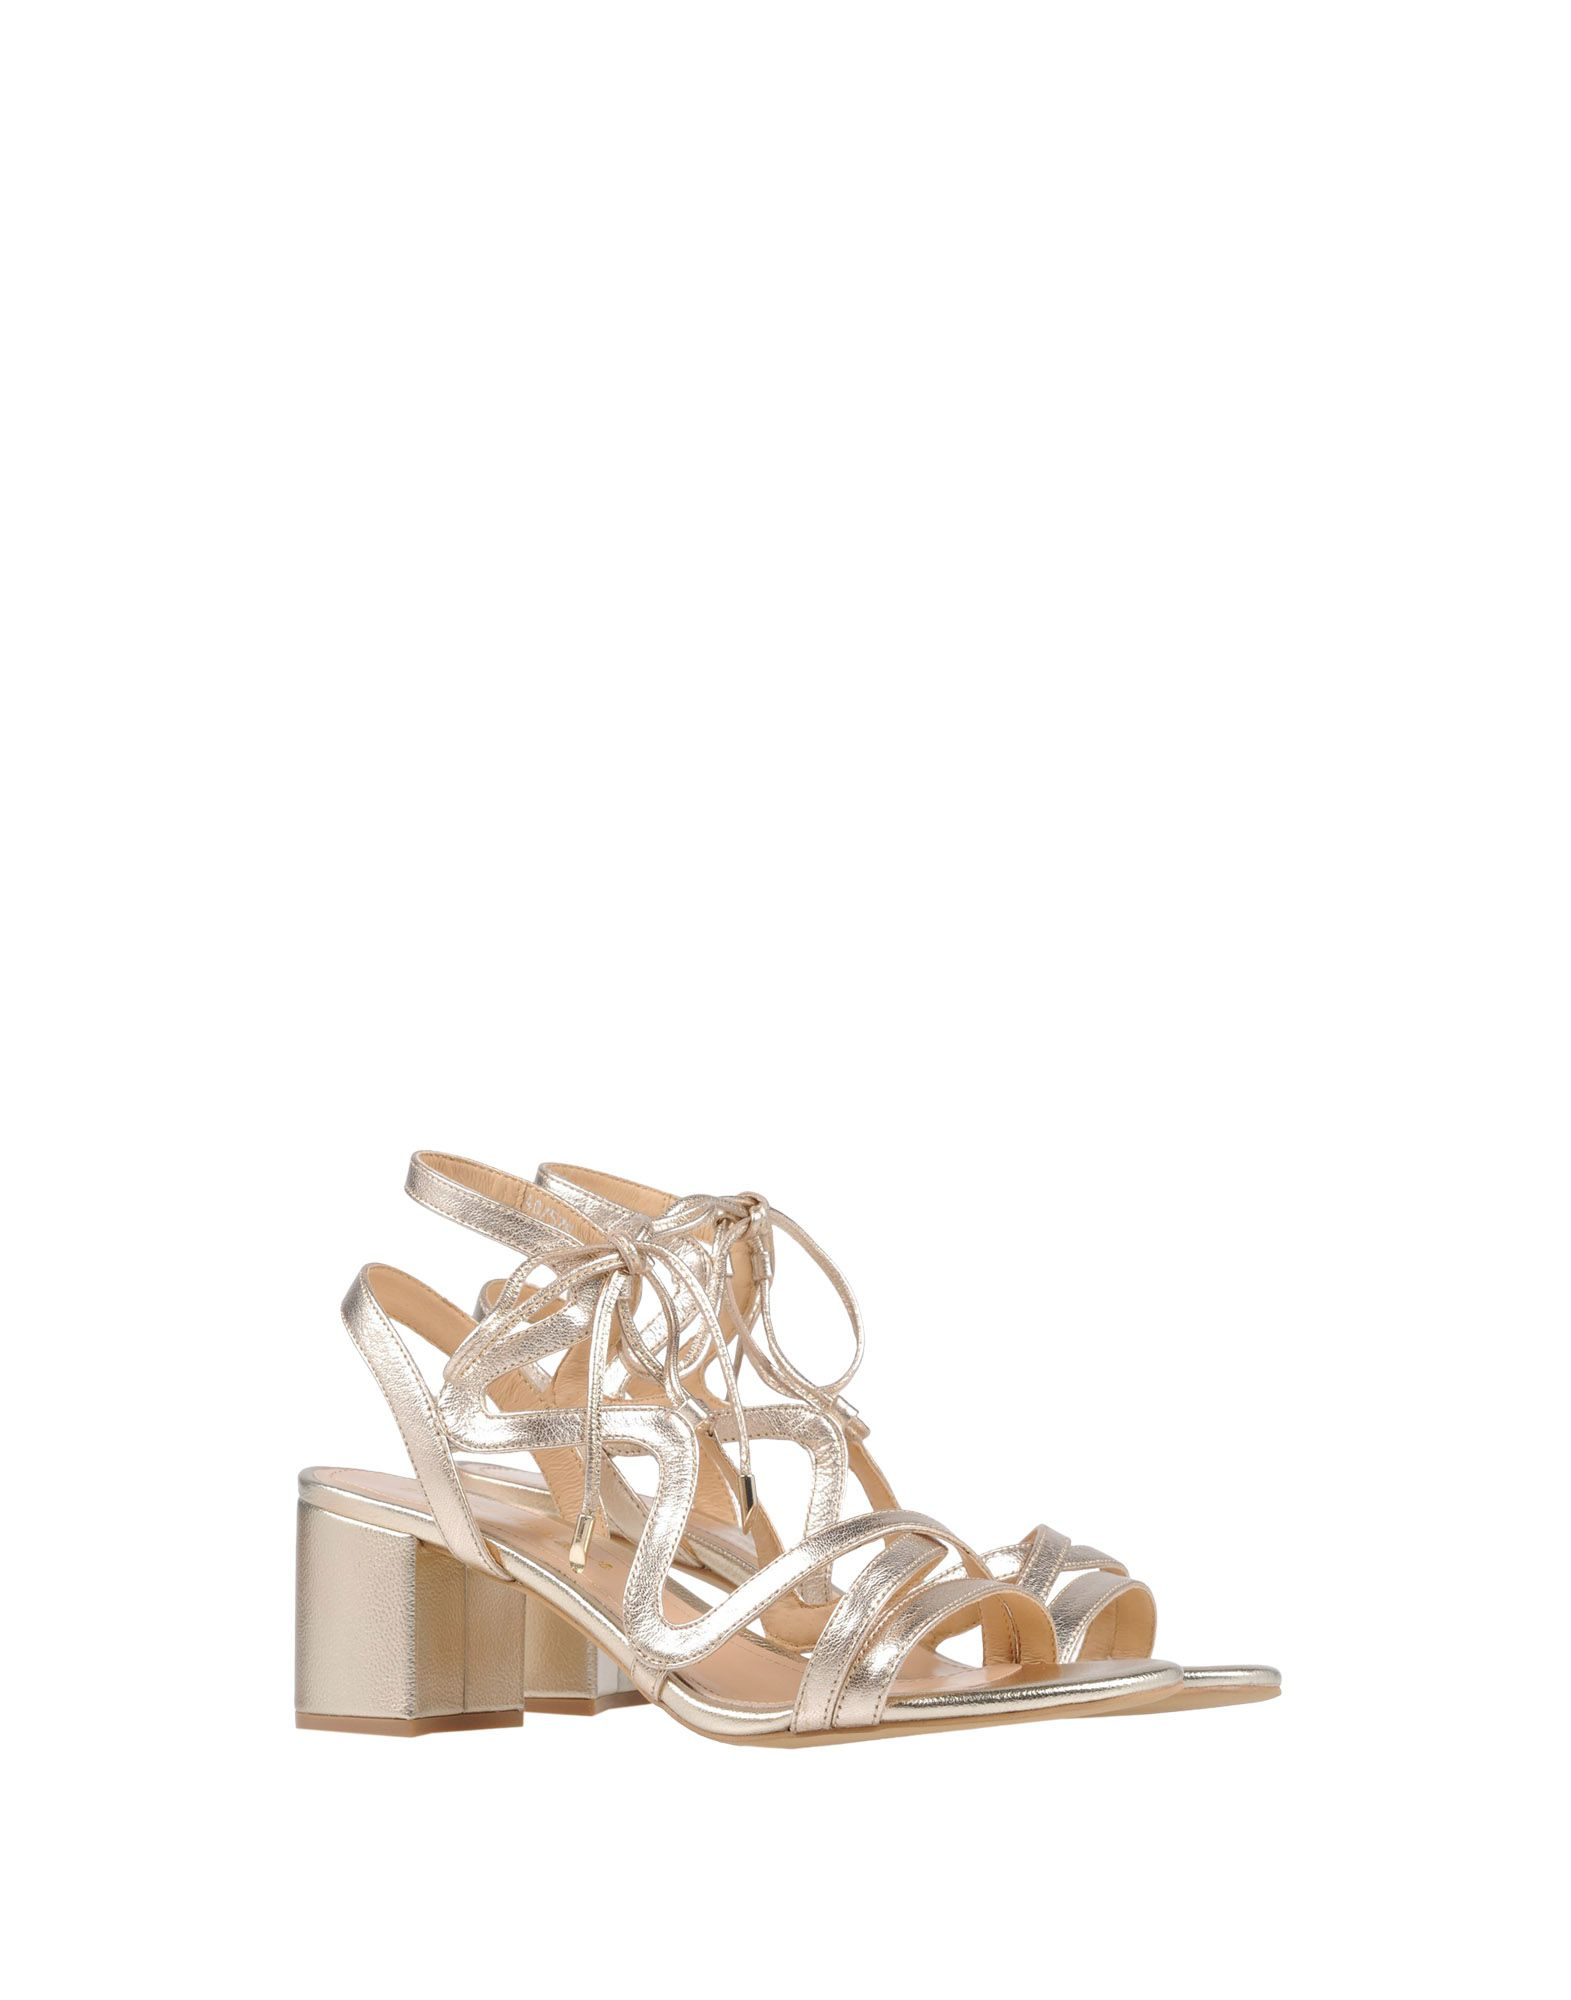 Gut um Sandalen billige Schuhe zu tragenBruno Premi Sandalen um Damen  11443581CU ebc2ca